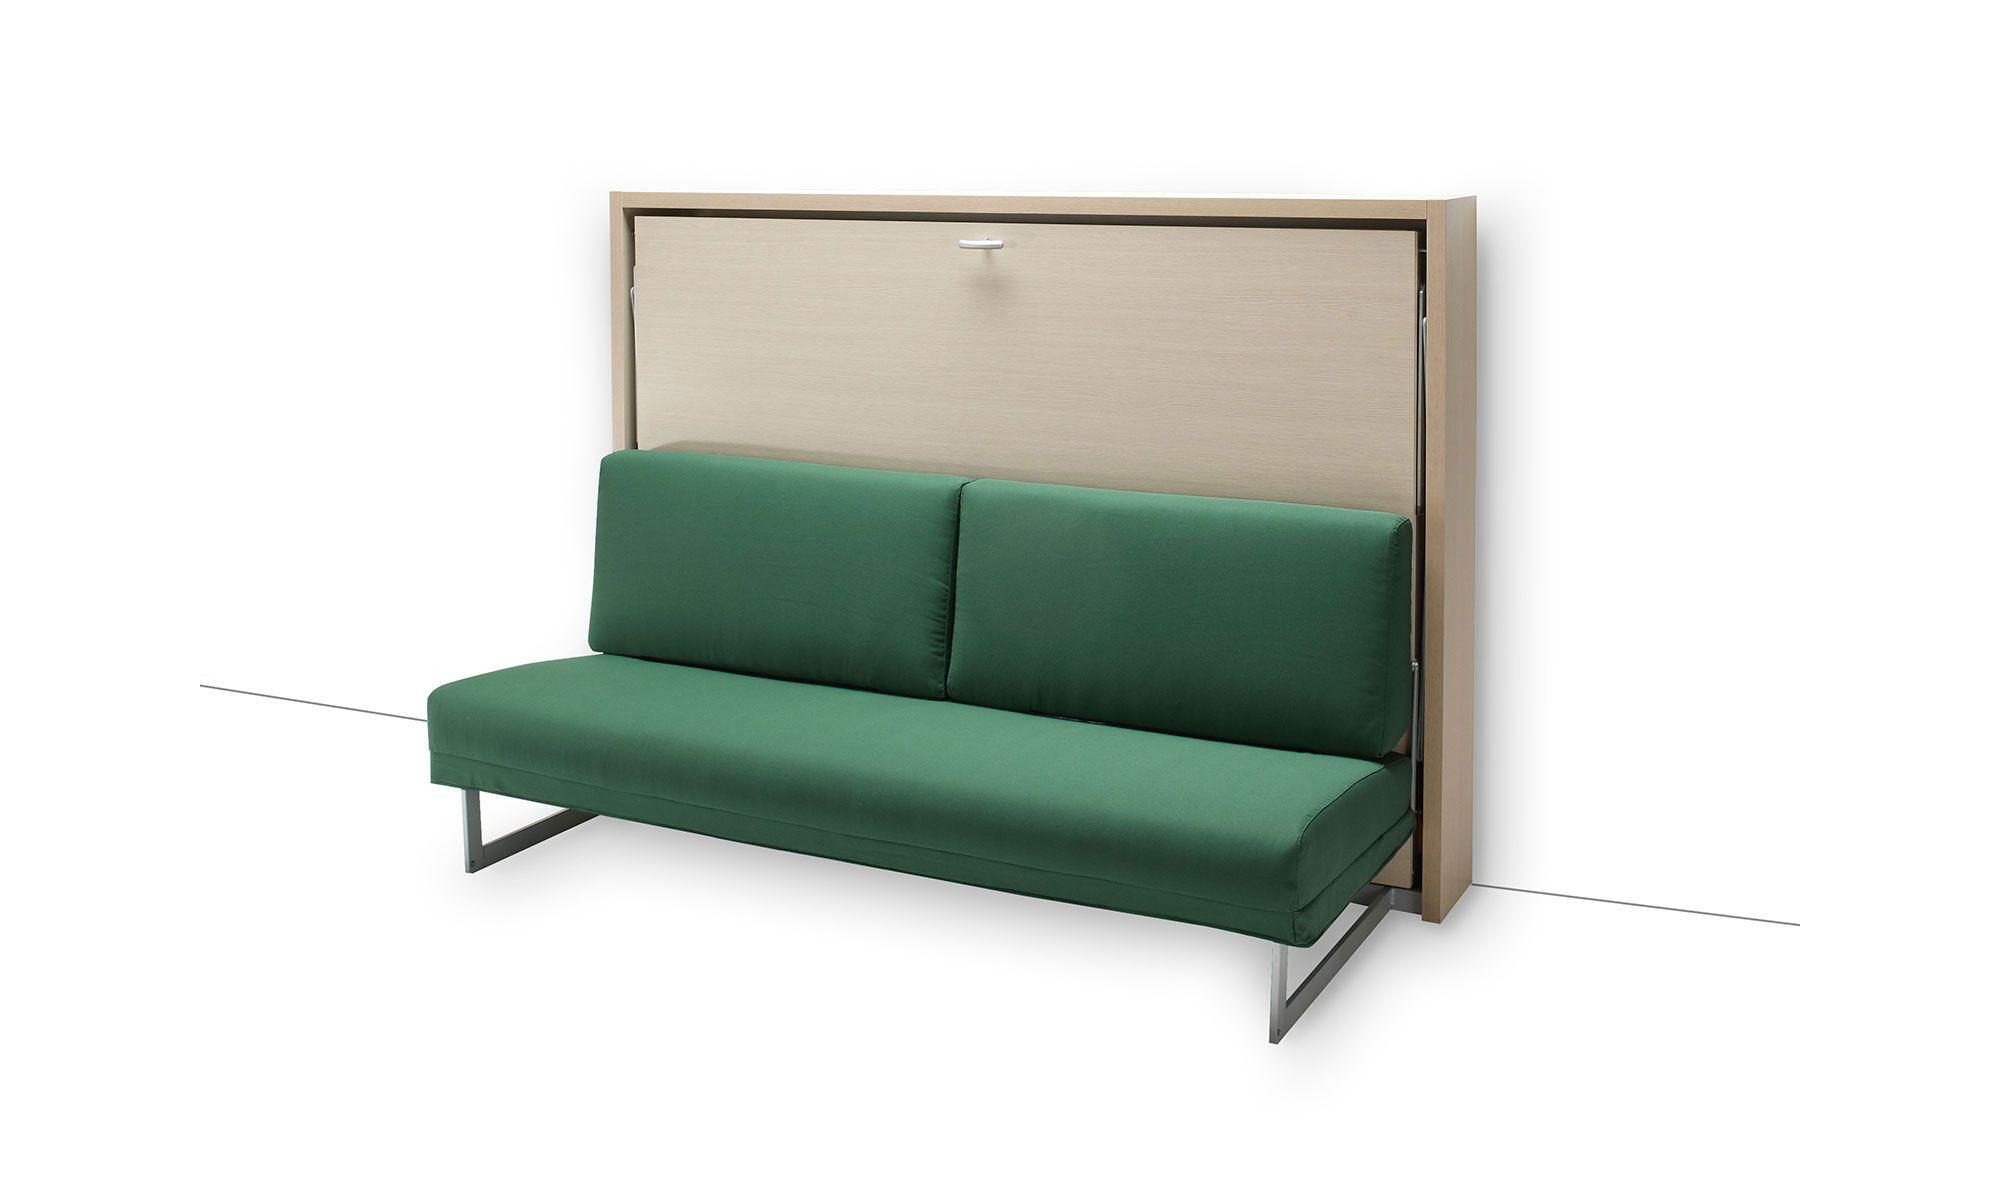 Sofa Cama Desplegable S5d8 sofa Cama Abatible Houdini orizzontale Material Acero Cama De